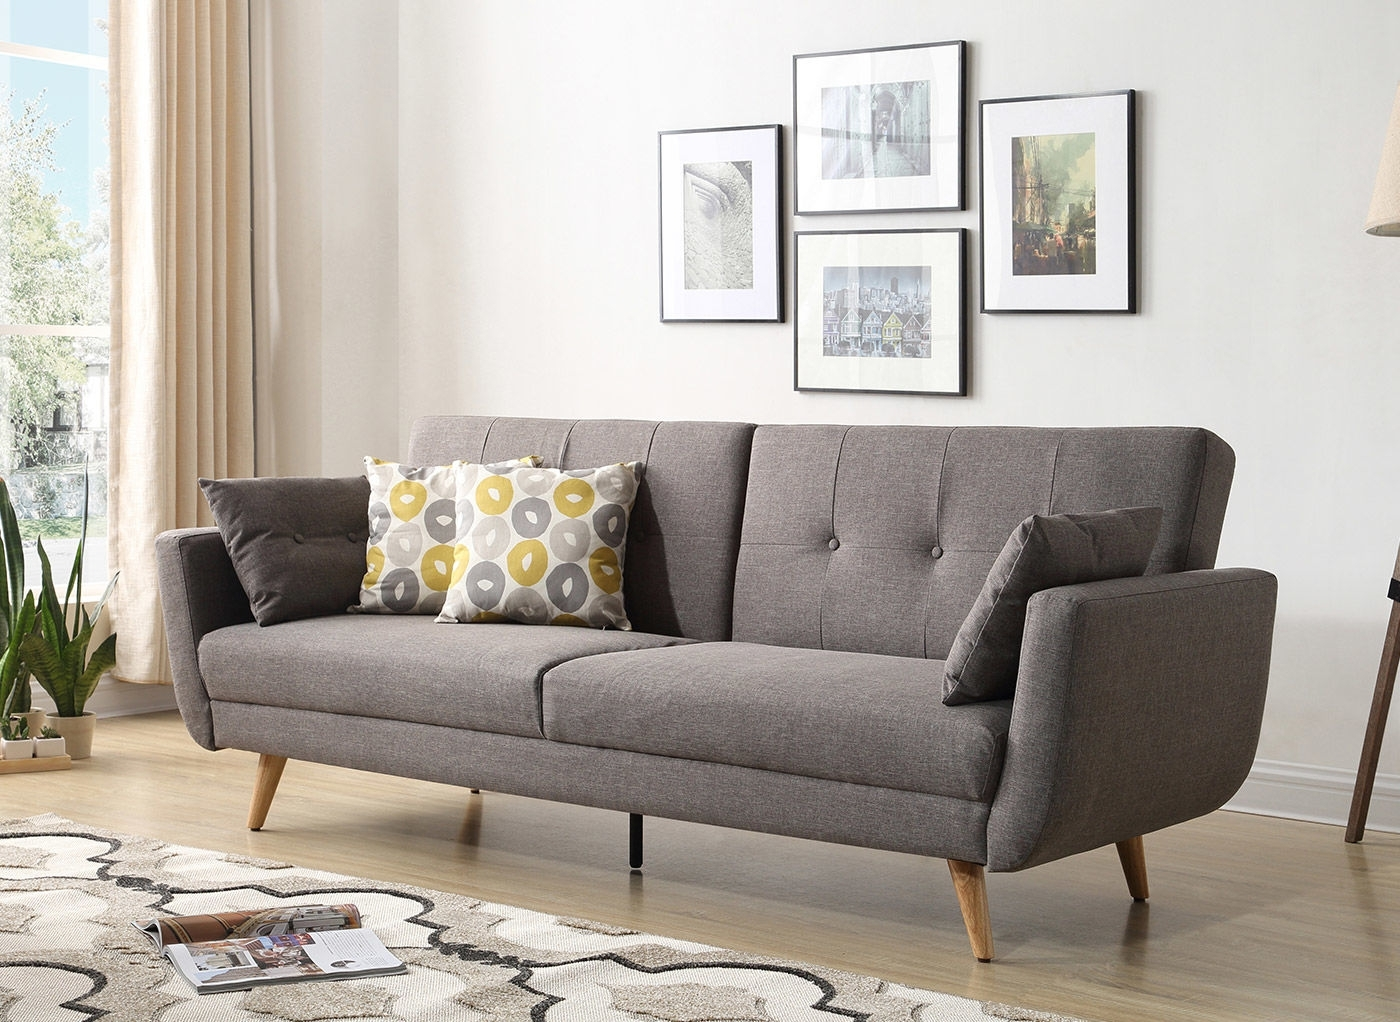 2017 Mid Range Sofas Regarding Mid Range Sofas Uk – Hereo Sofa (View 2 of 15)